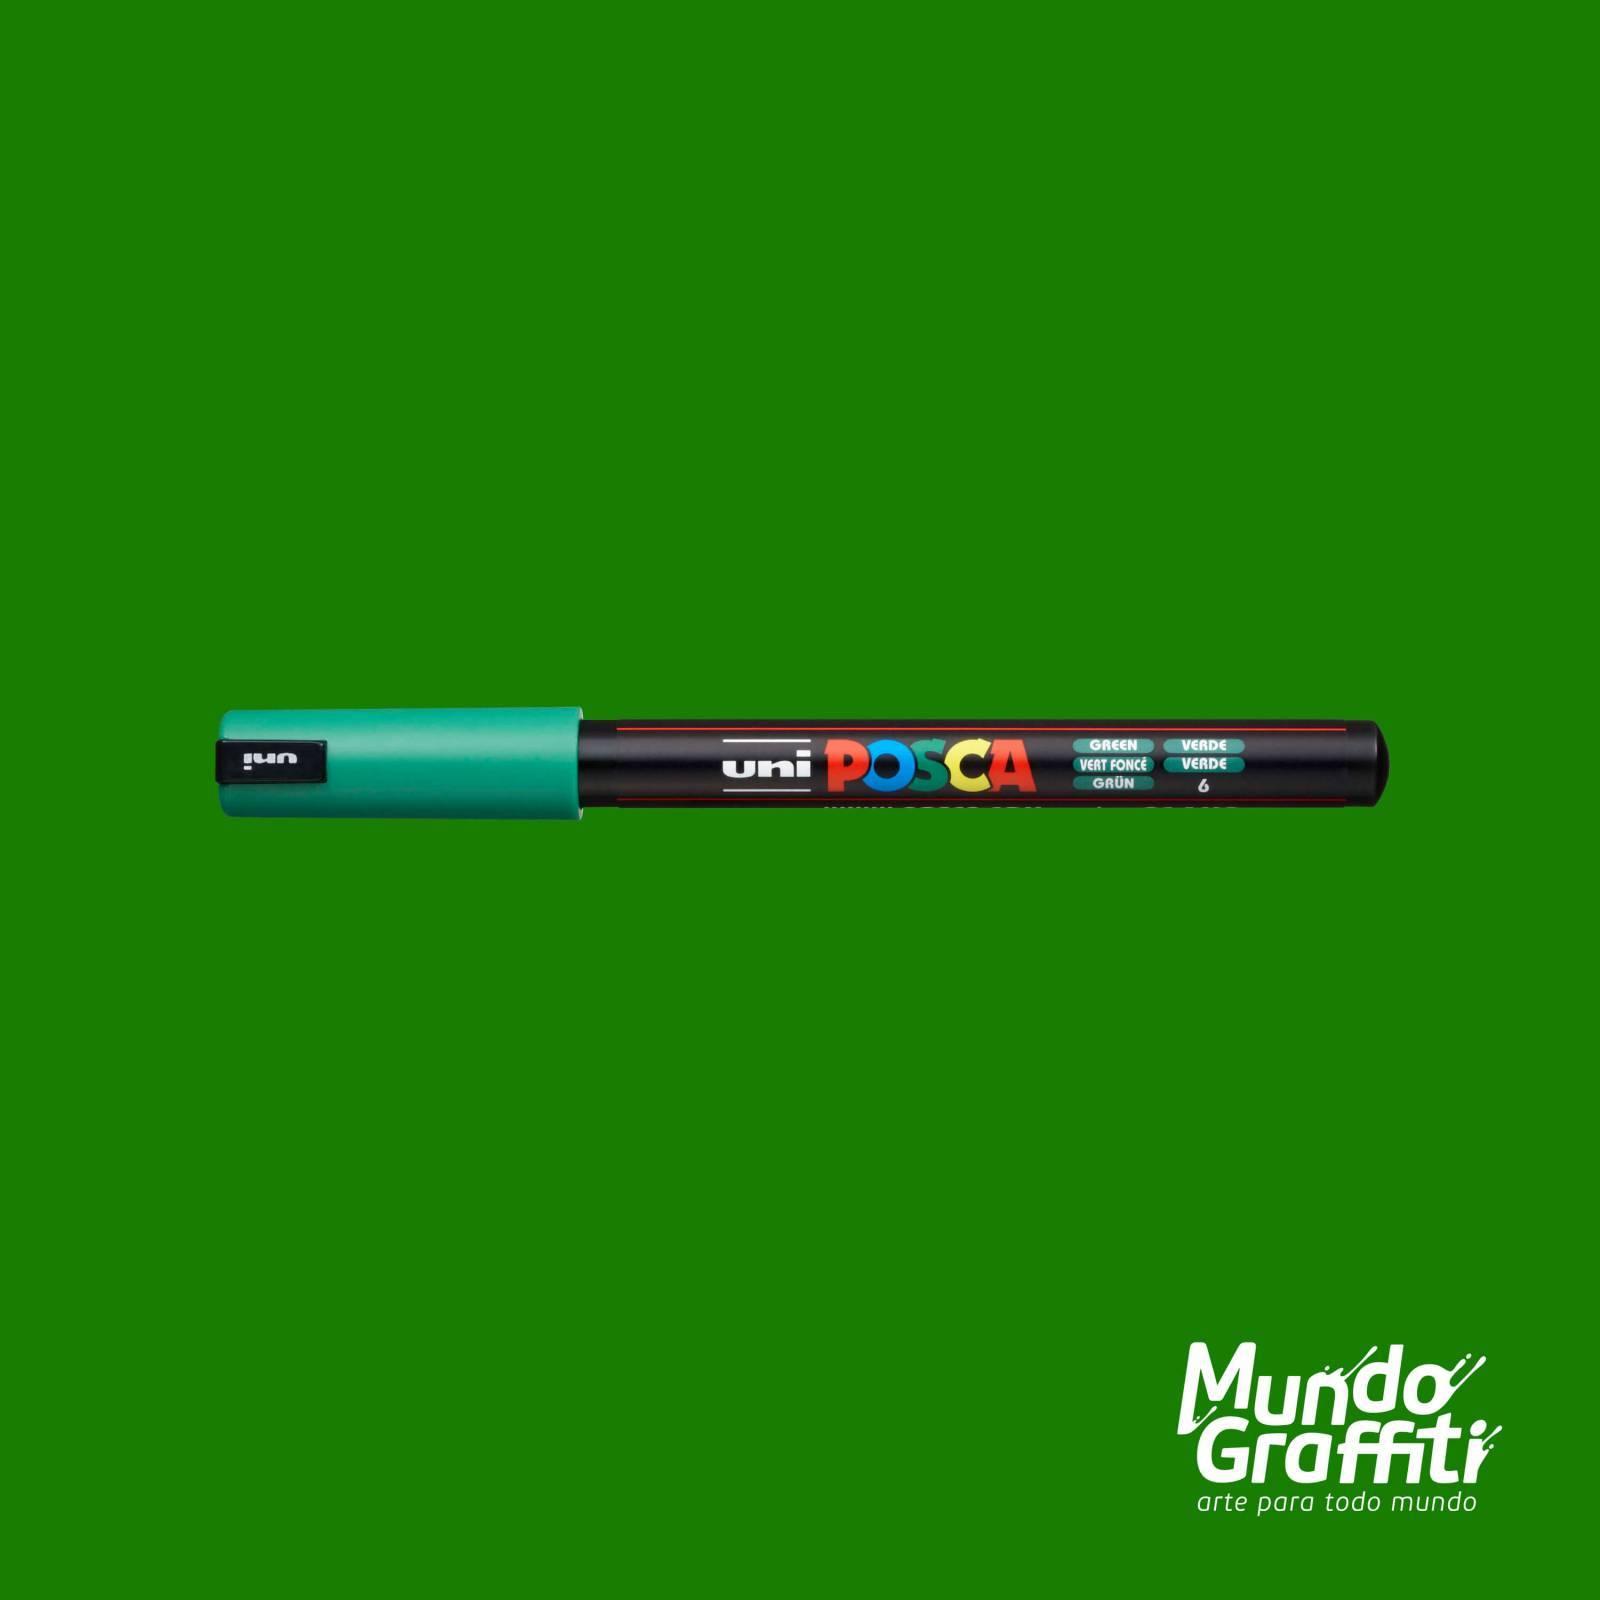 Caneta Posca 1MR Verde - Mundo Graffiti